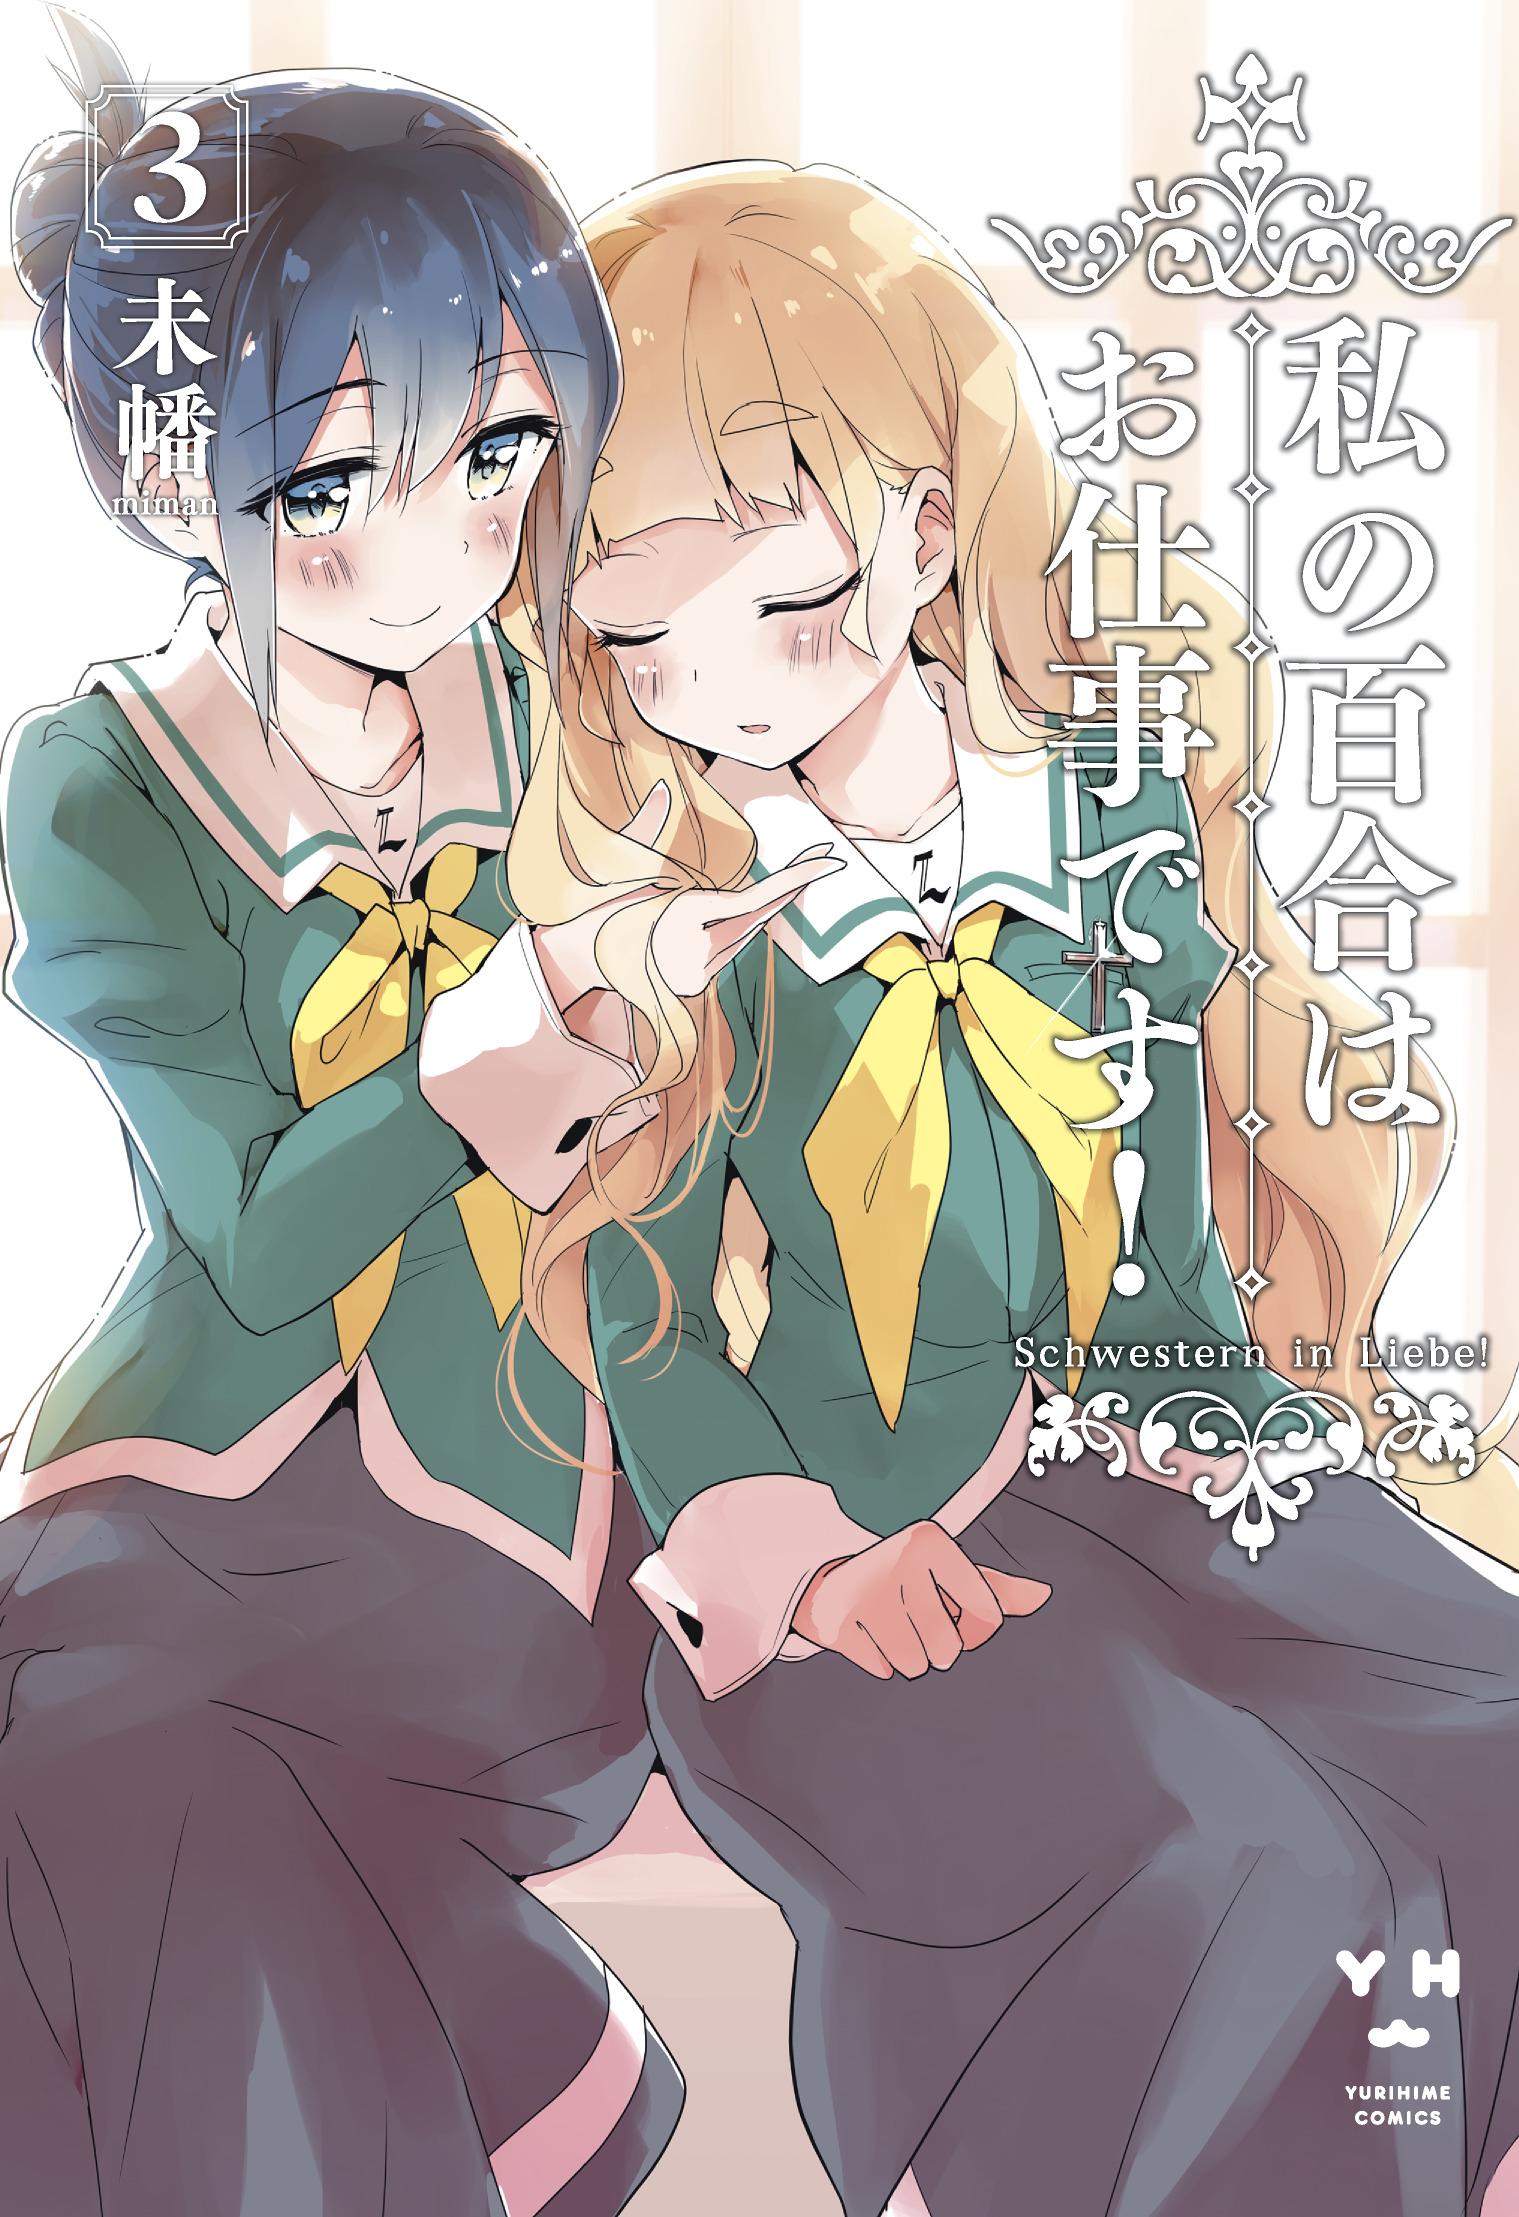 køb manga